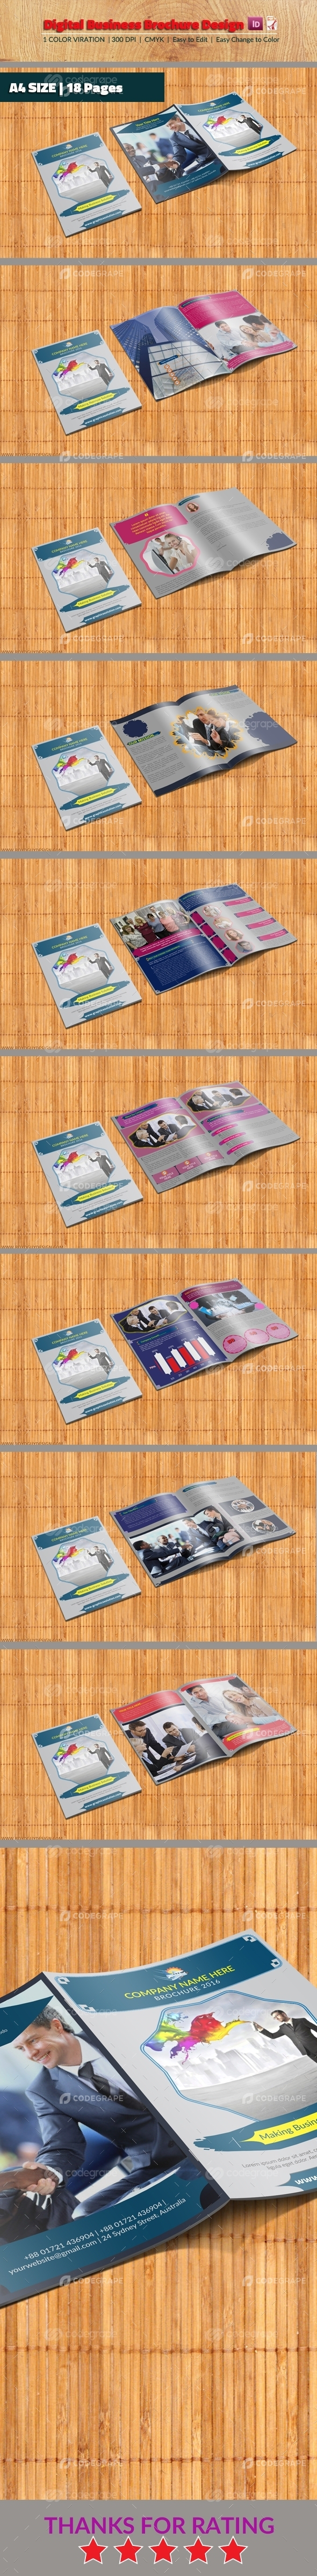 Digital Business Brochure Design